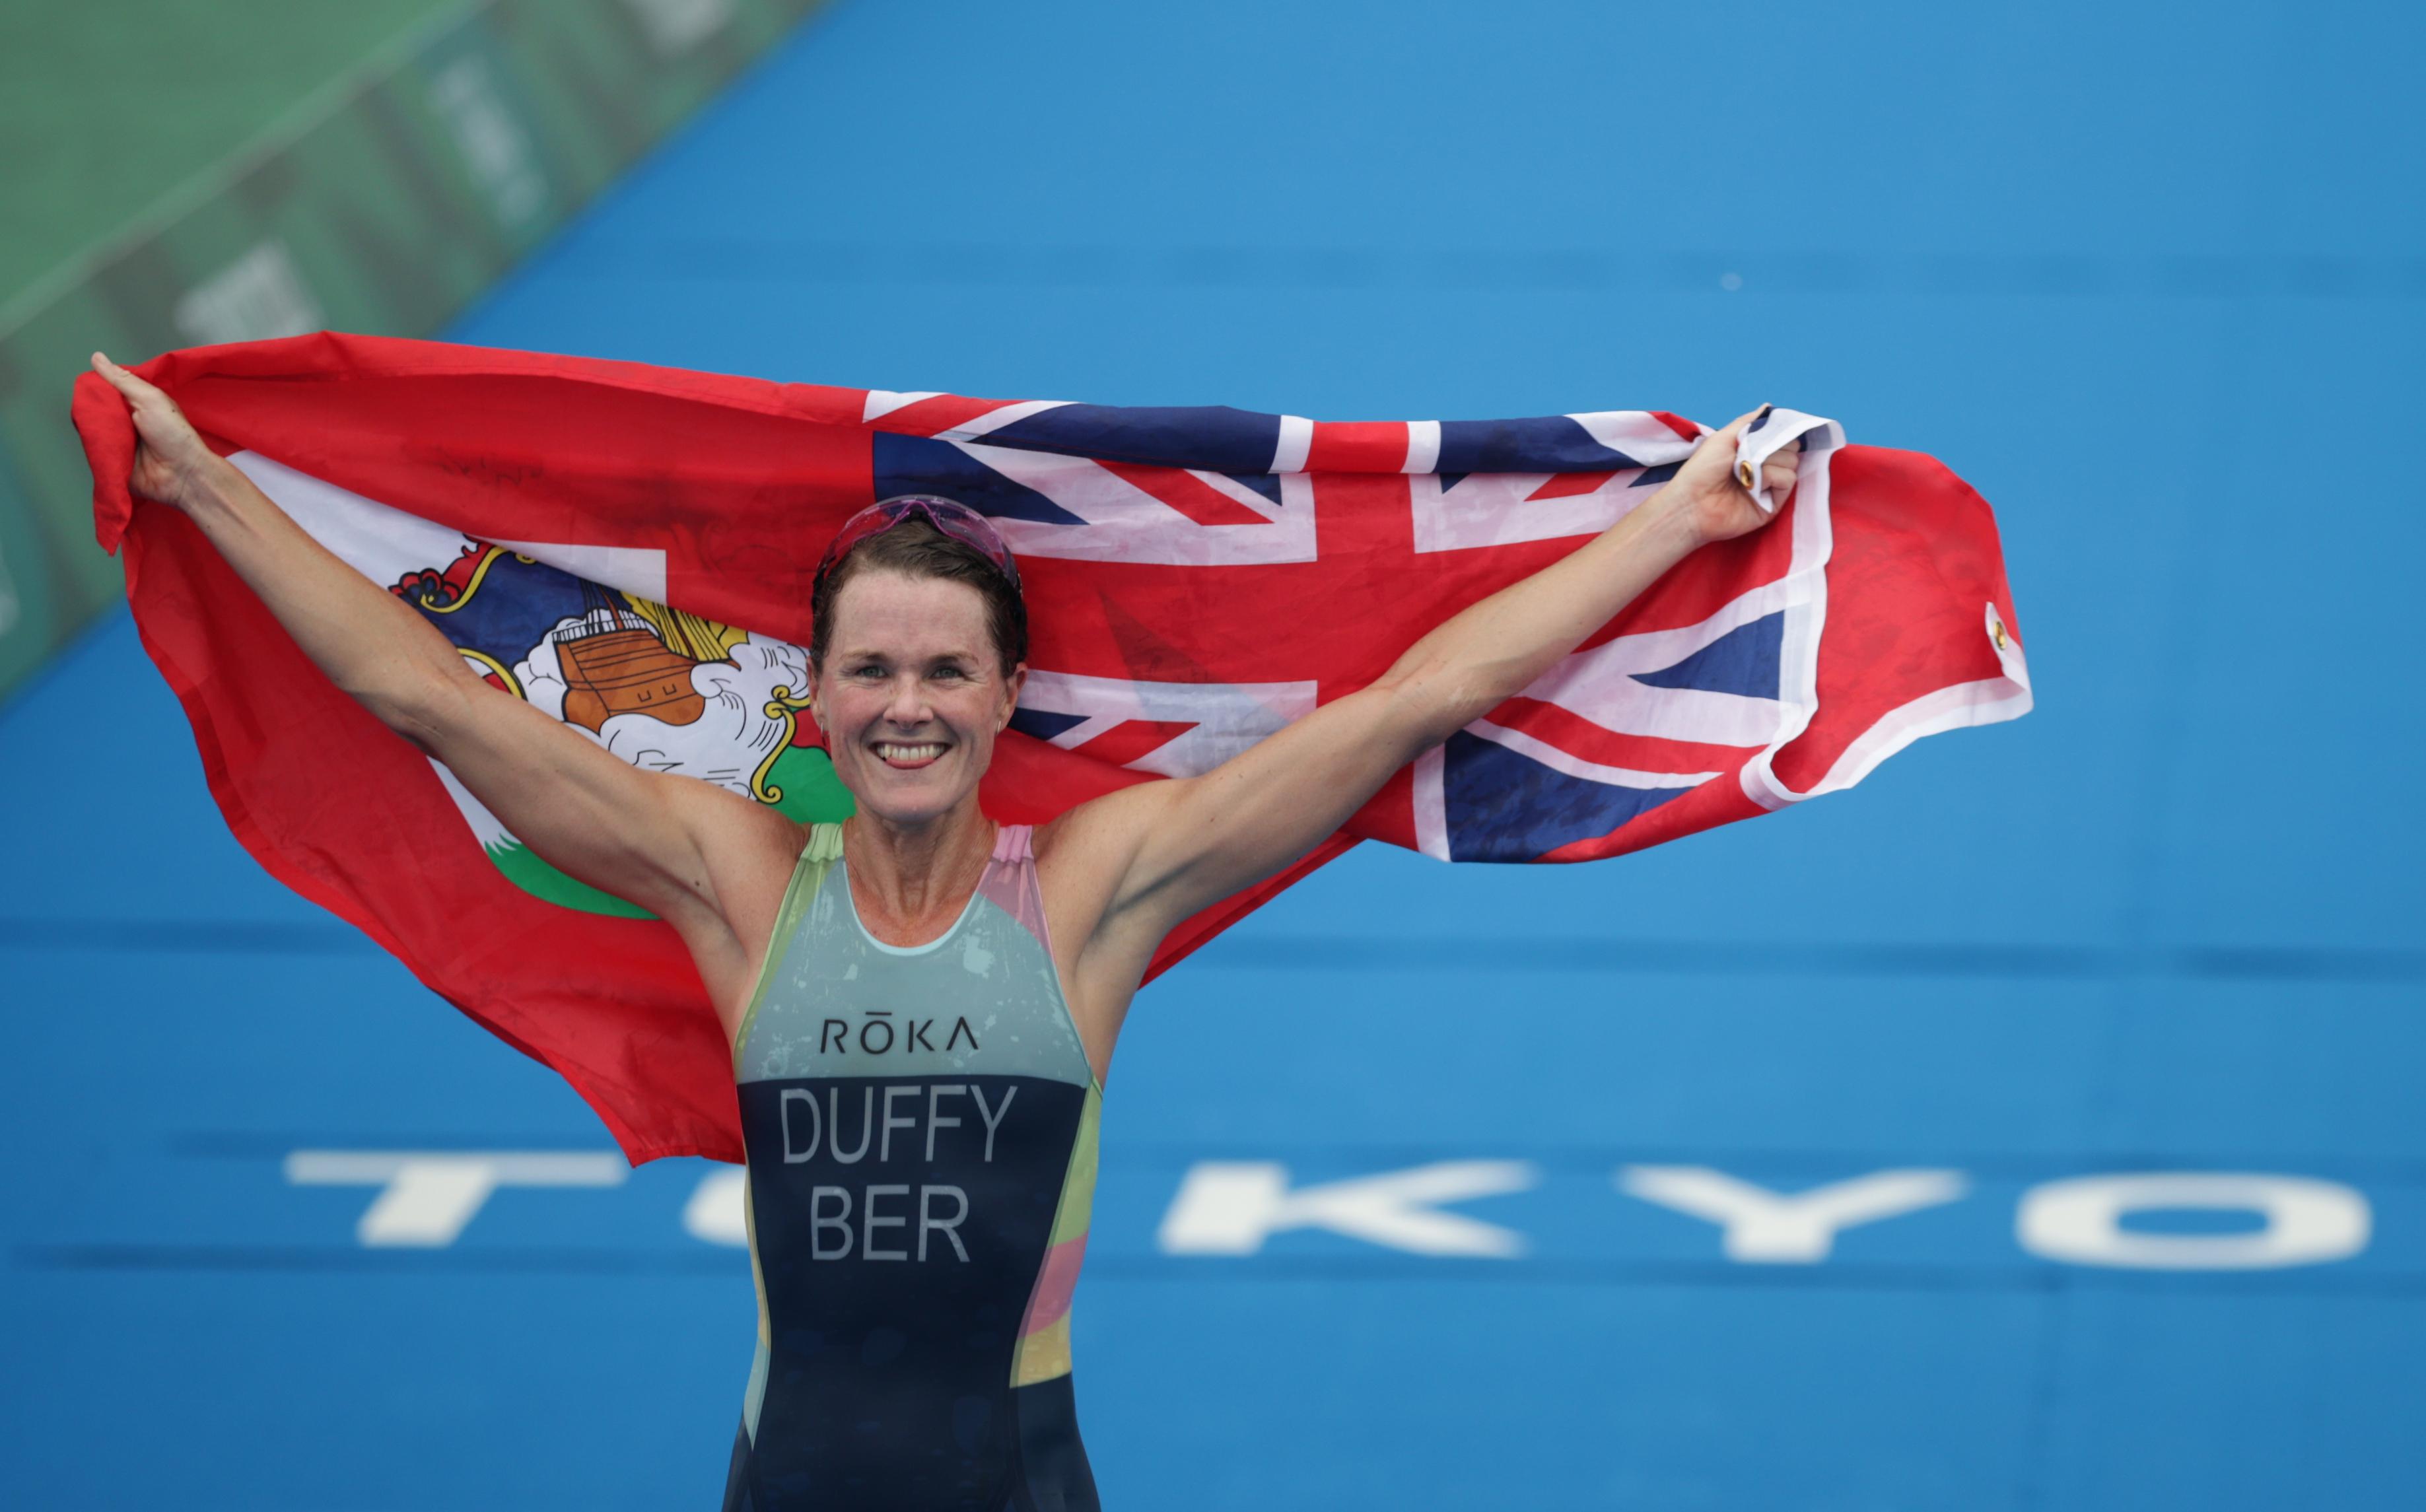 Tokyo 2020 Olympics - Triathlon - Women's Olympic Distance - Final - Odaiba Marine Park, Tokyo, Japan July 27, 2021. Flora Duffy of Bermuda holds national flag as she celebrates victory. REUTERS/Hannah Mckay